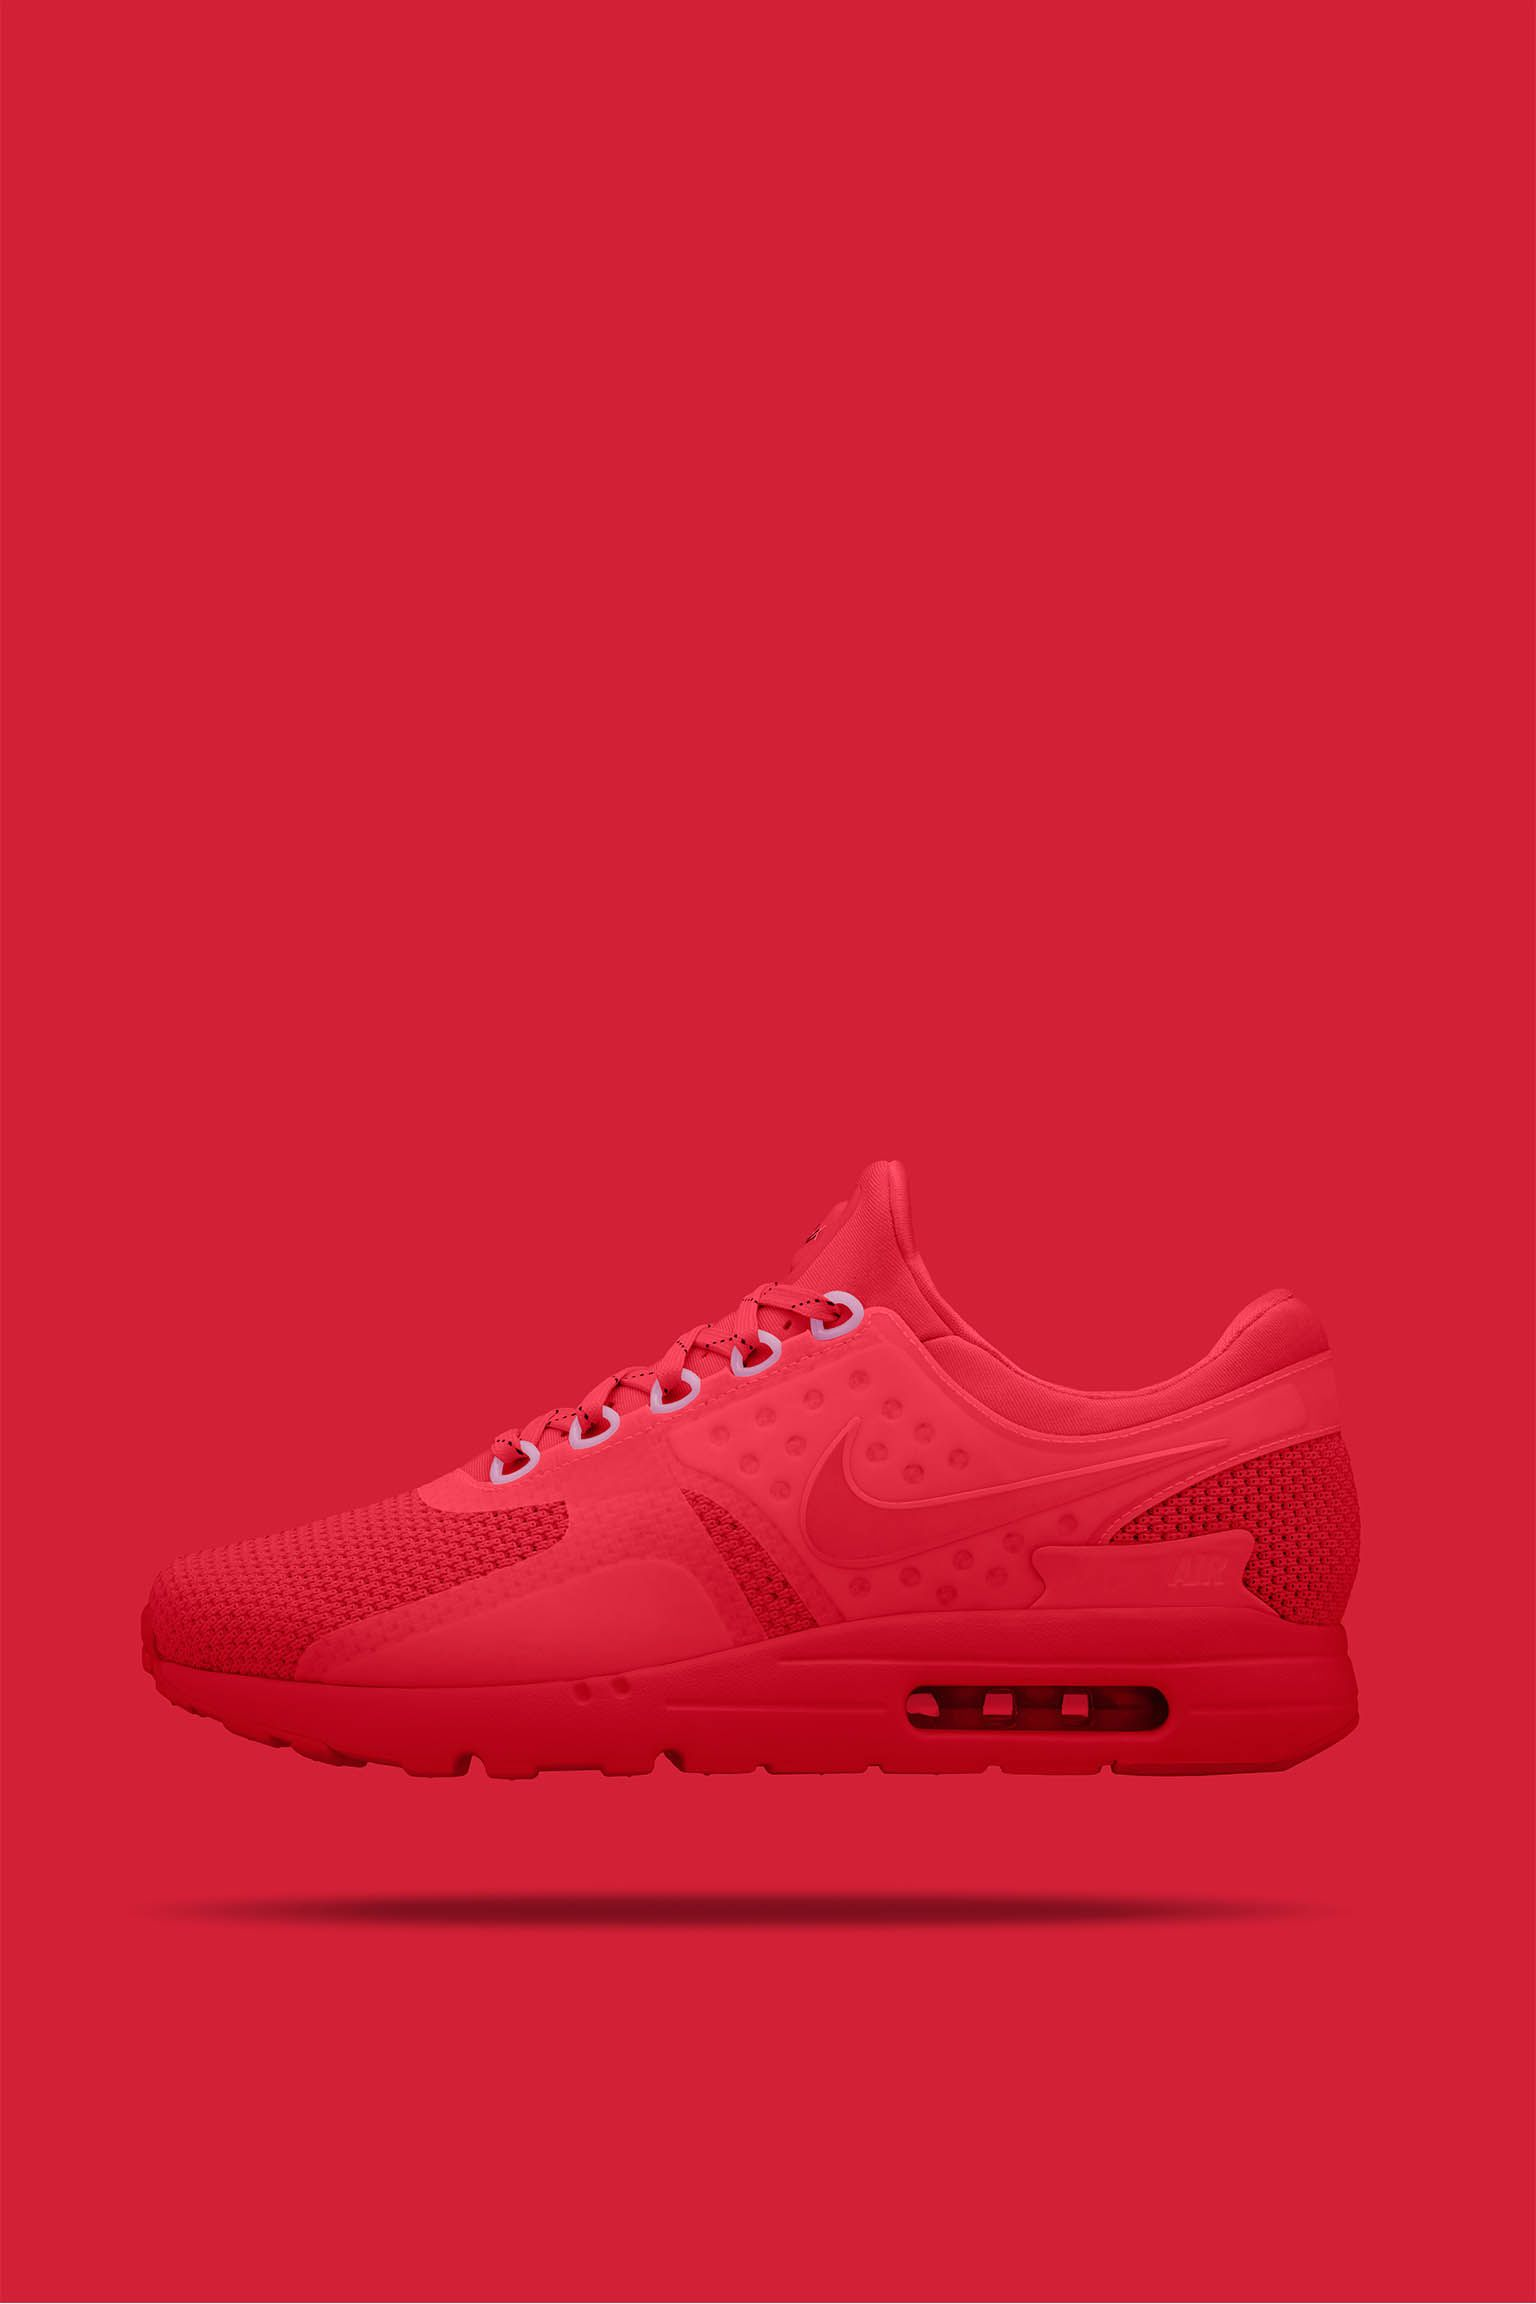 Nike Air Max Zero iD Release Date